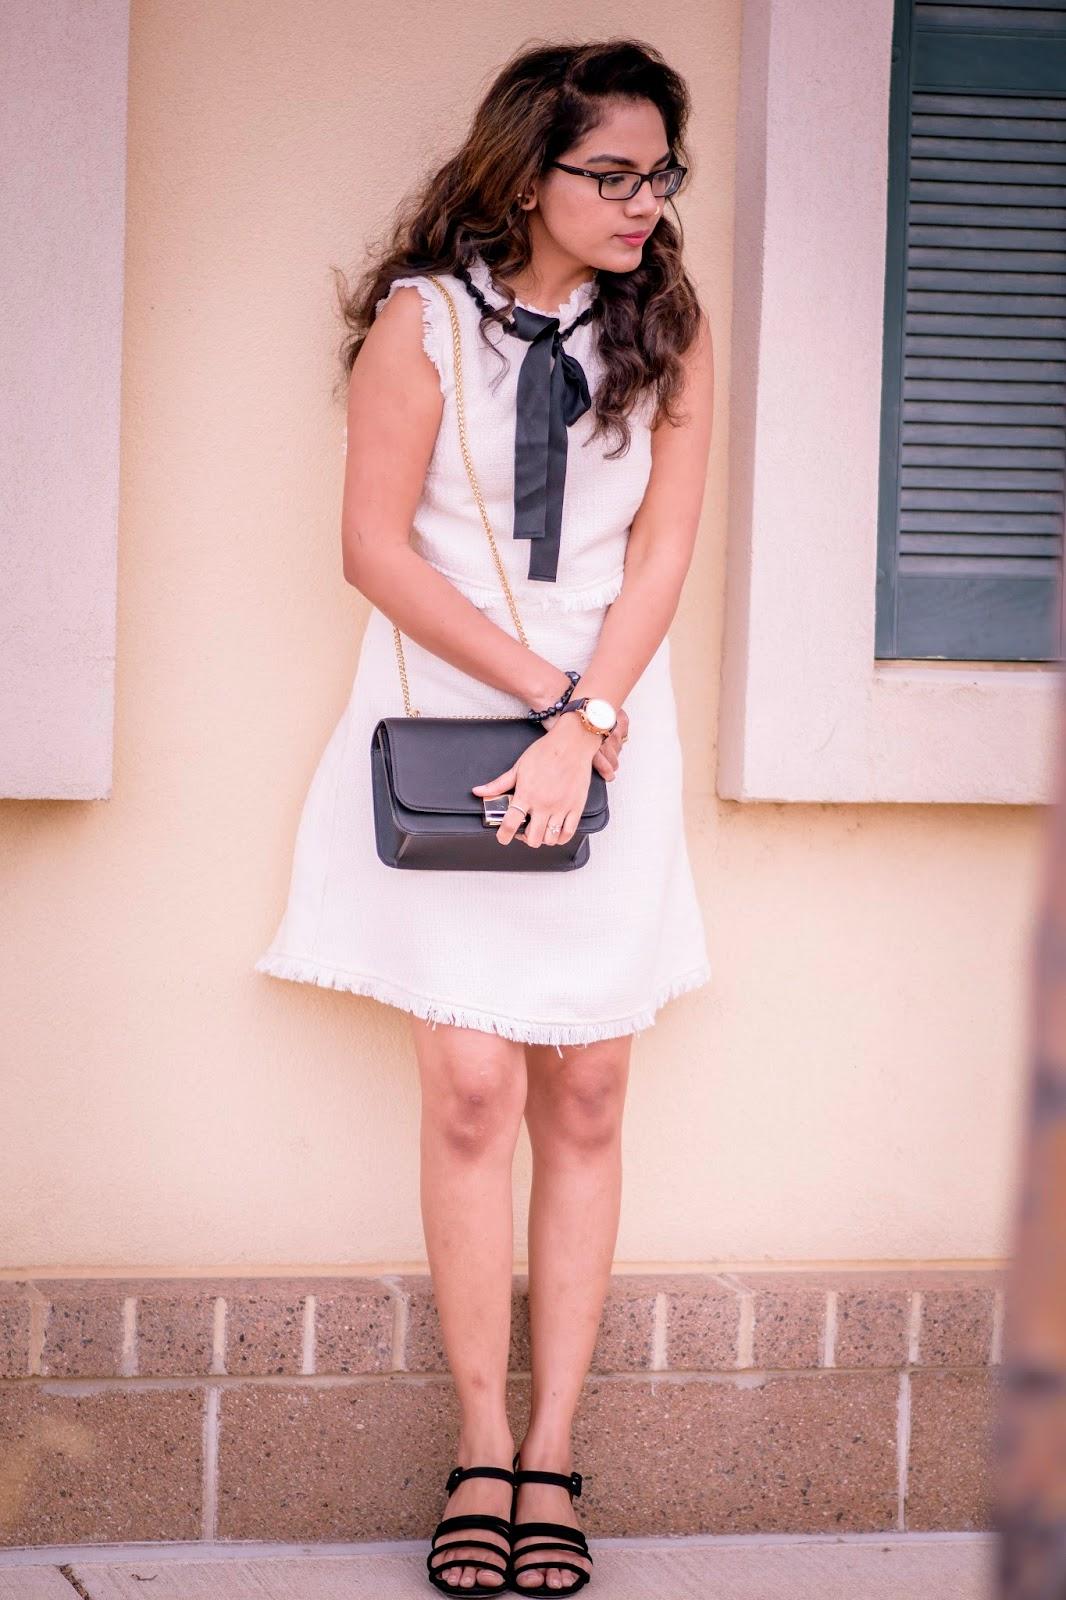 chanel-style-tweed-dress